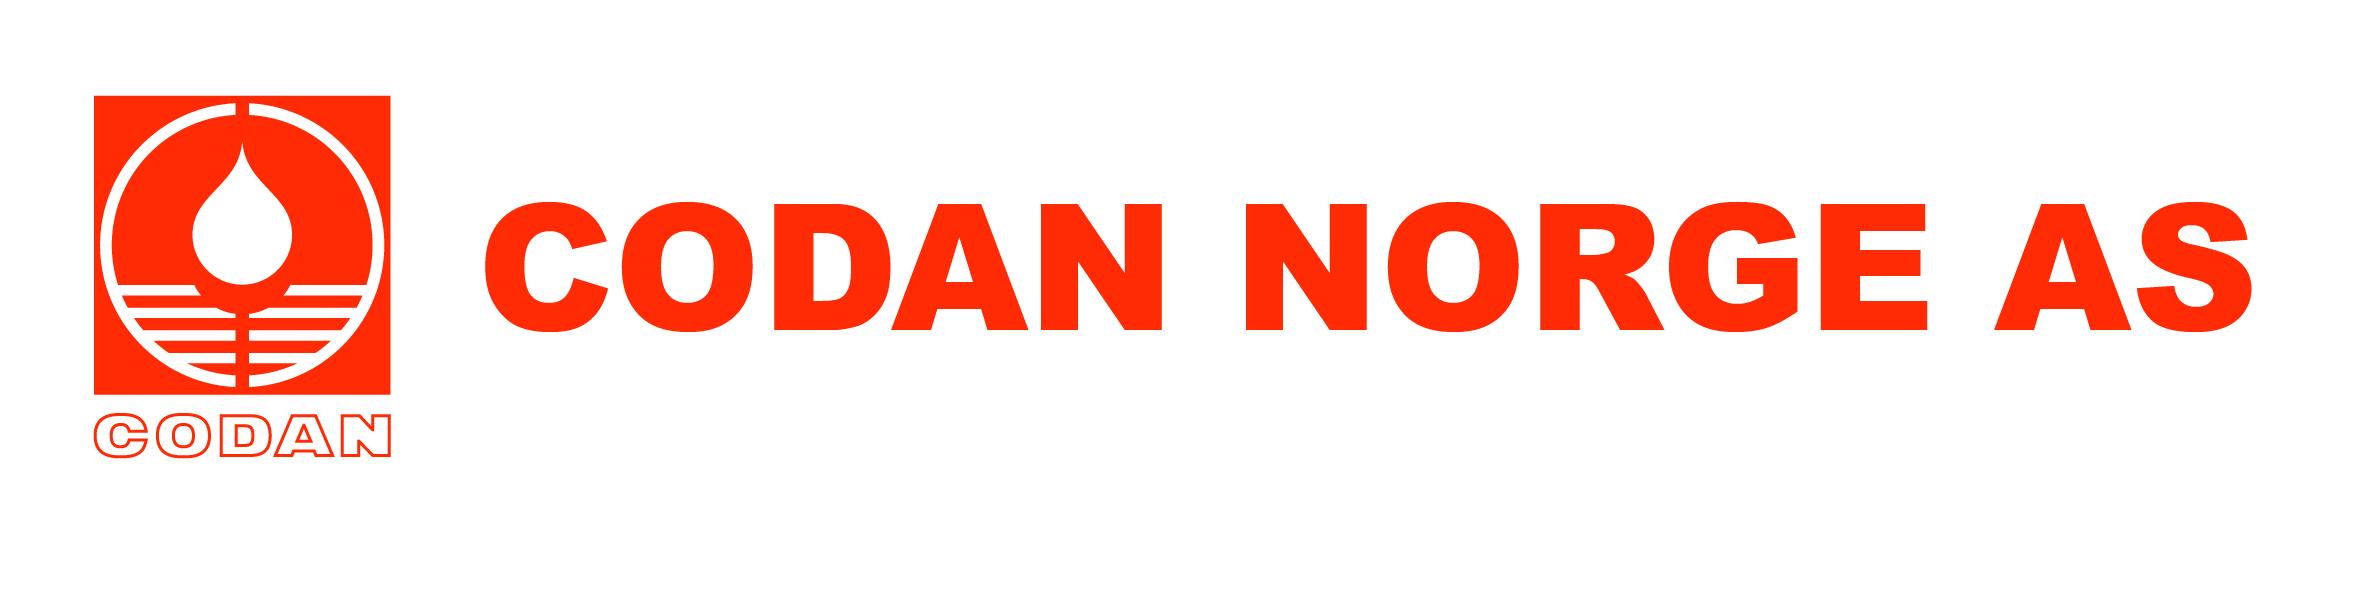 Codan Norge As